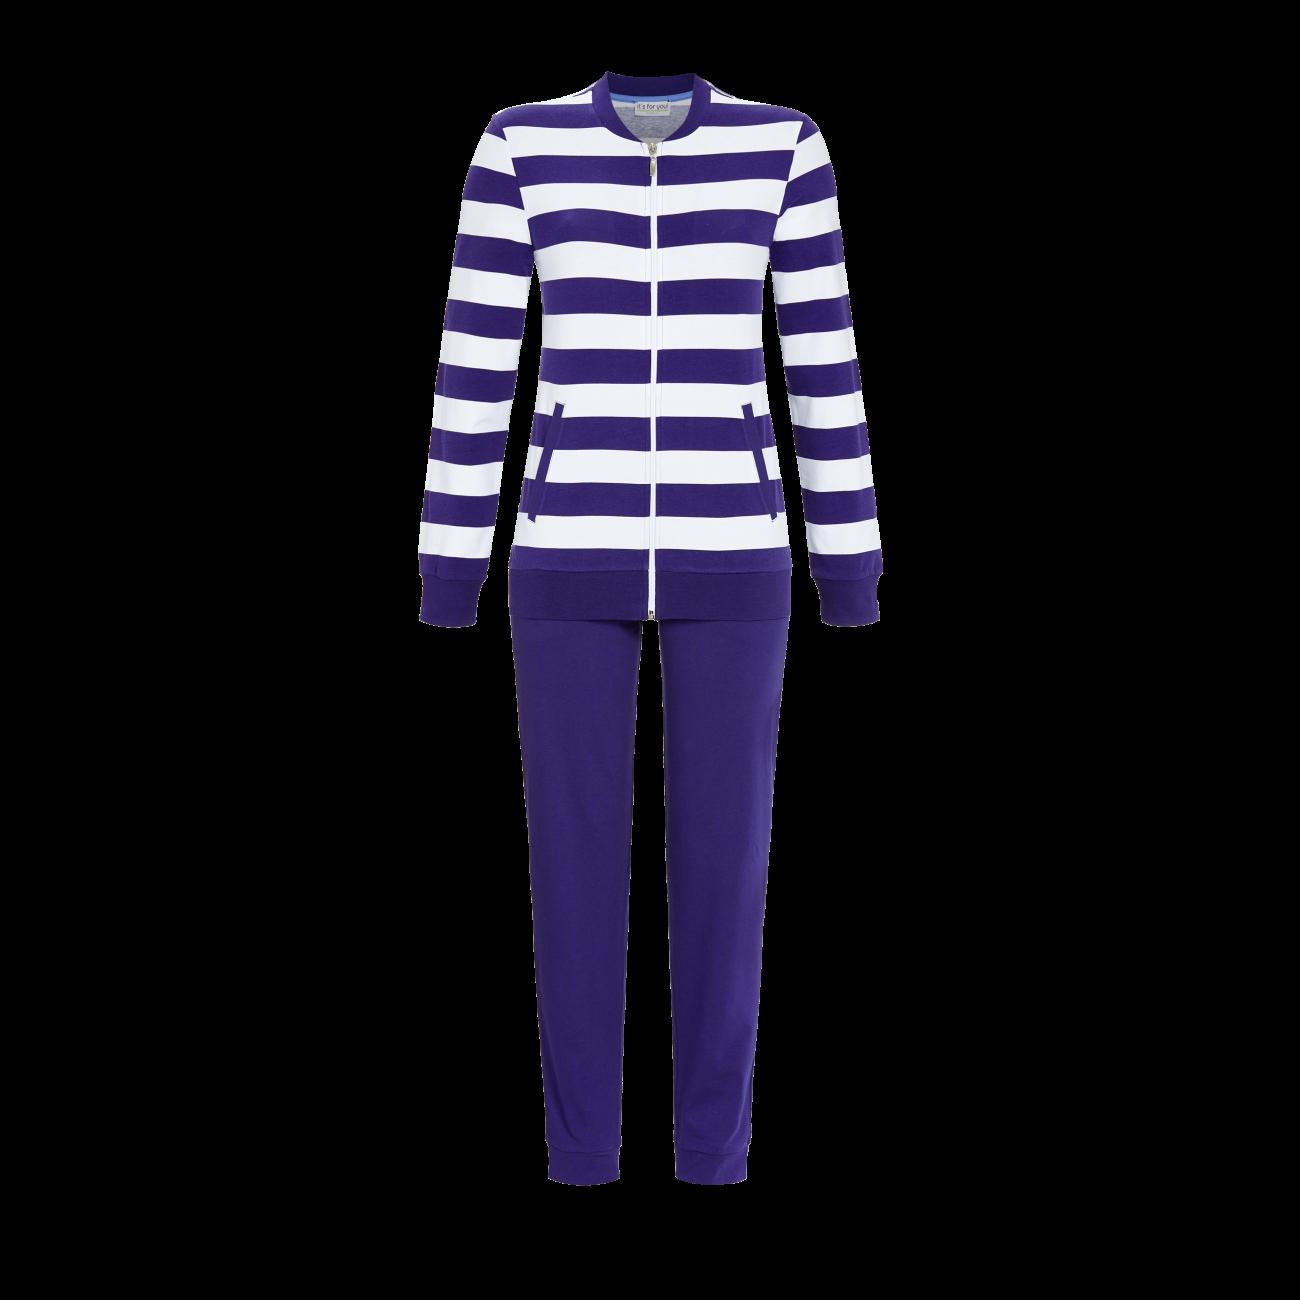 Anzug mit langer Hose iris | 36